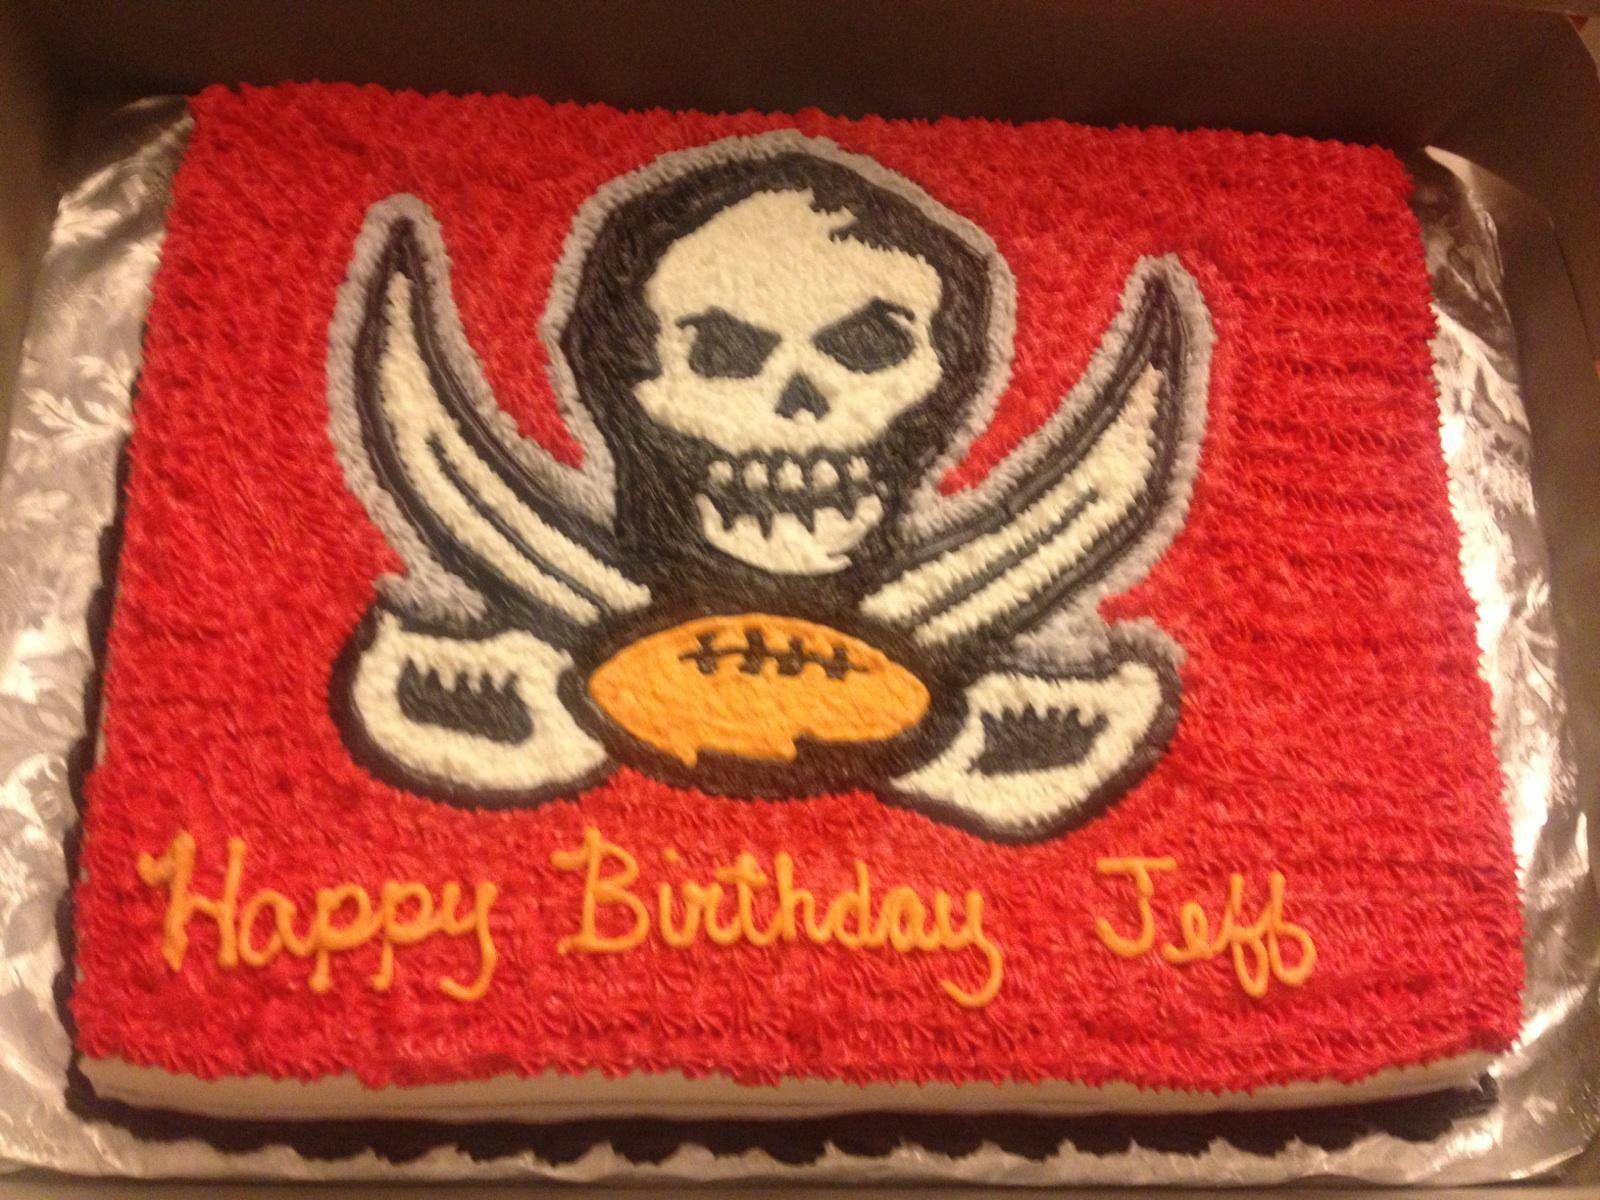 Tampa Bay Bucs Birthday Cake Vanilla Cake With Almond Cream Icing Tampa Bay Buccaneers Tampa Bay Bucs Birthday